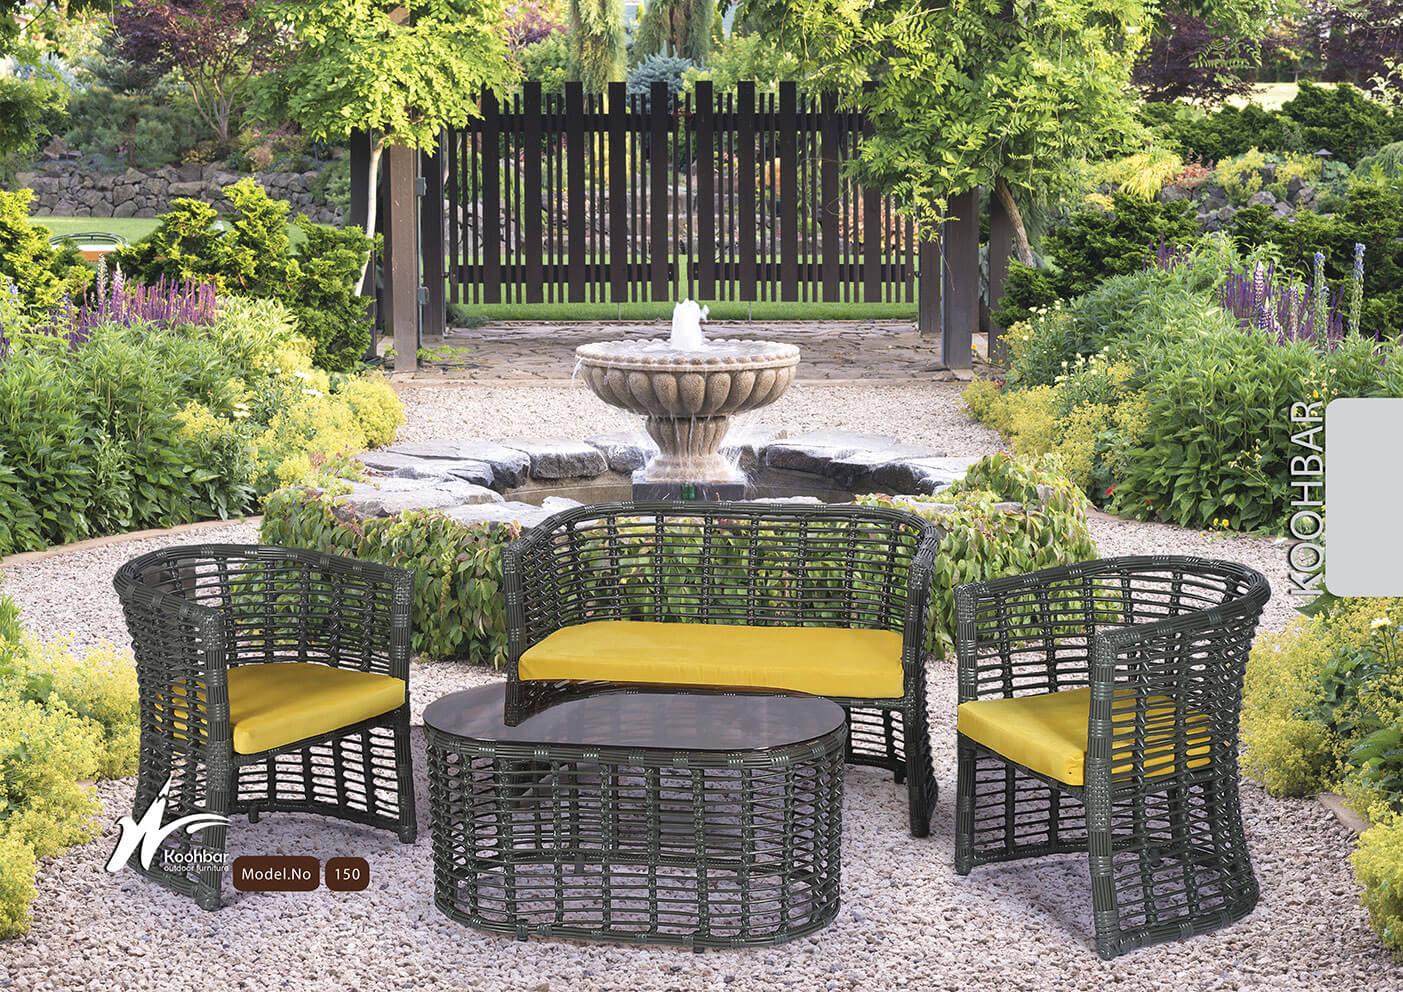 kohbar patio conversation sets 150 model0 - ست مبلمان حصیری فضای باز کوهبر مدل ۱۵۰ - - patio-conversation-sets